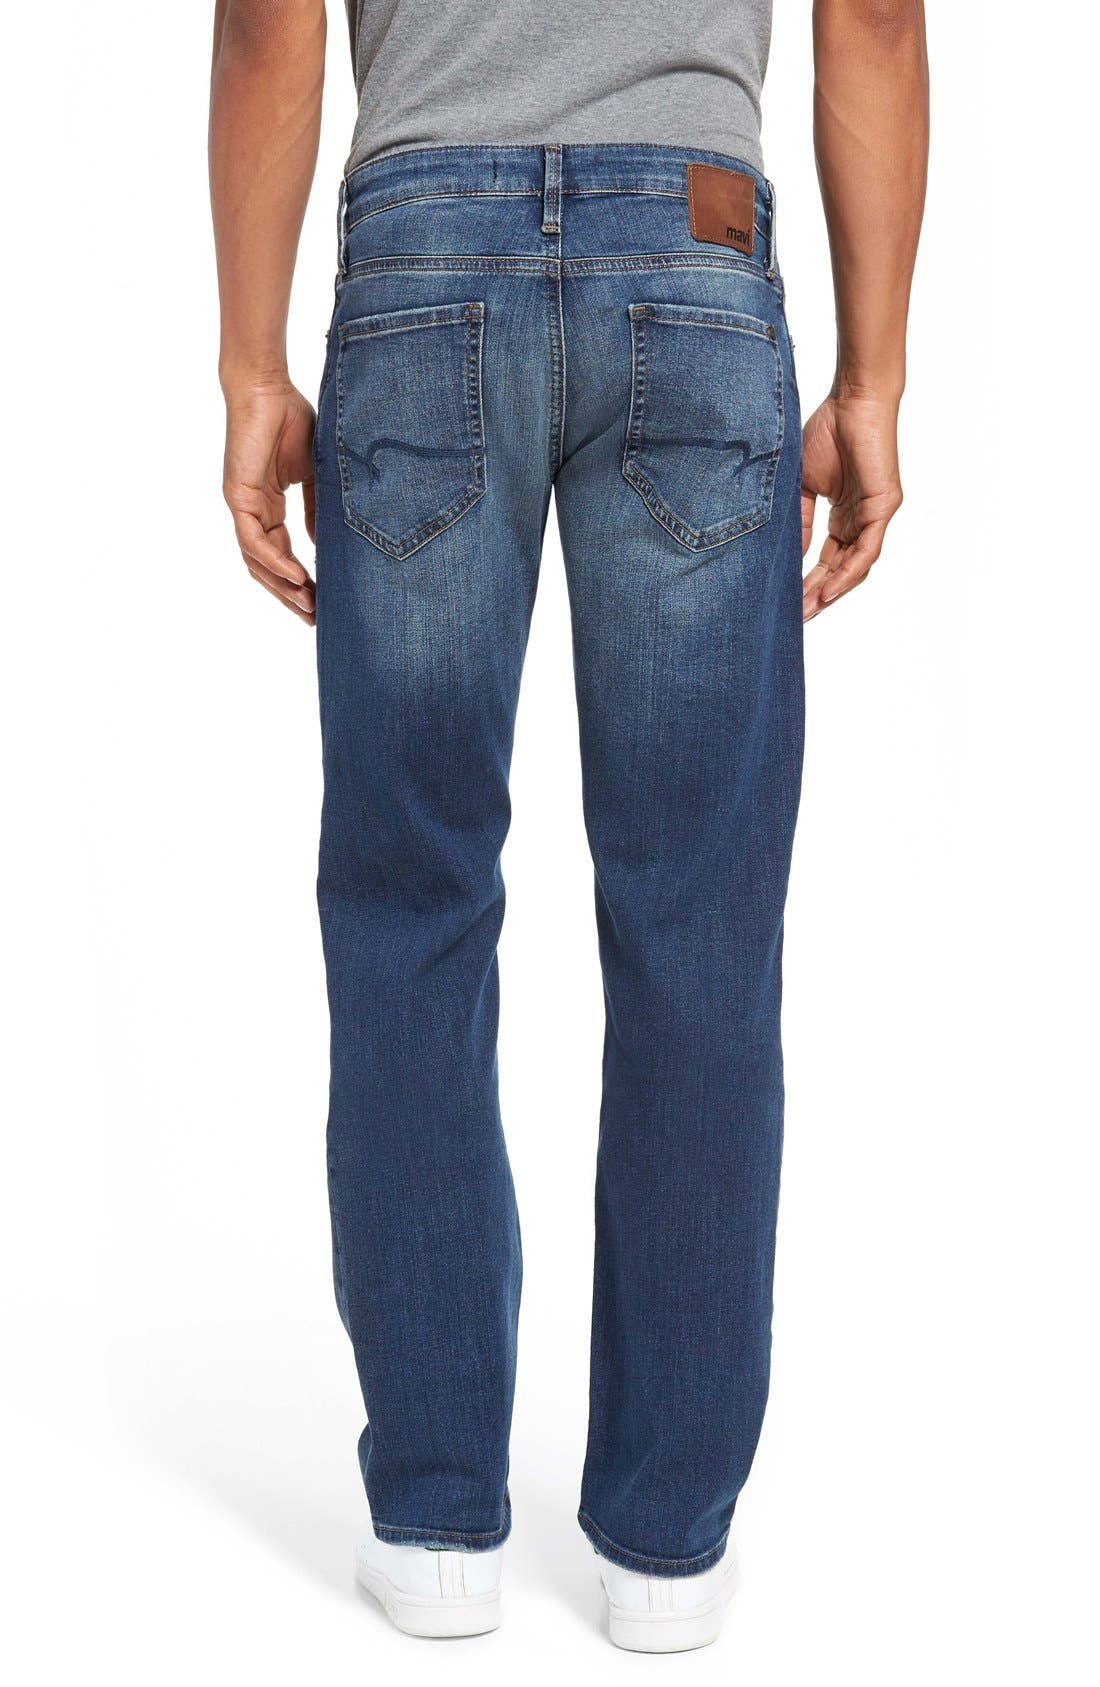 Alternate Image 2  - Mavi Jeans 'Zach' Straight Leg Jeans (Mid Blue)